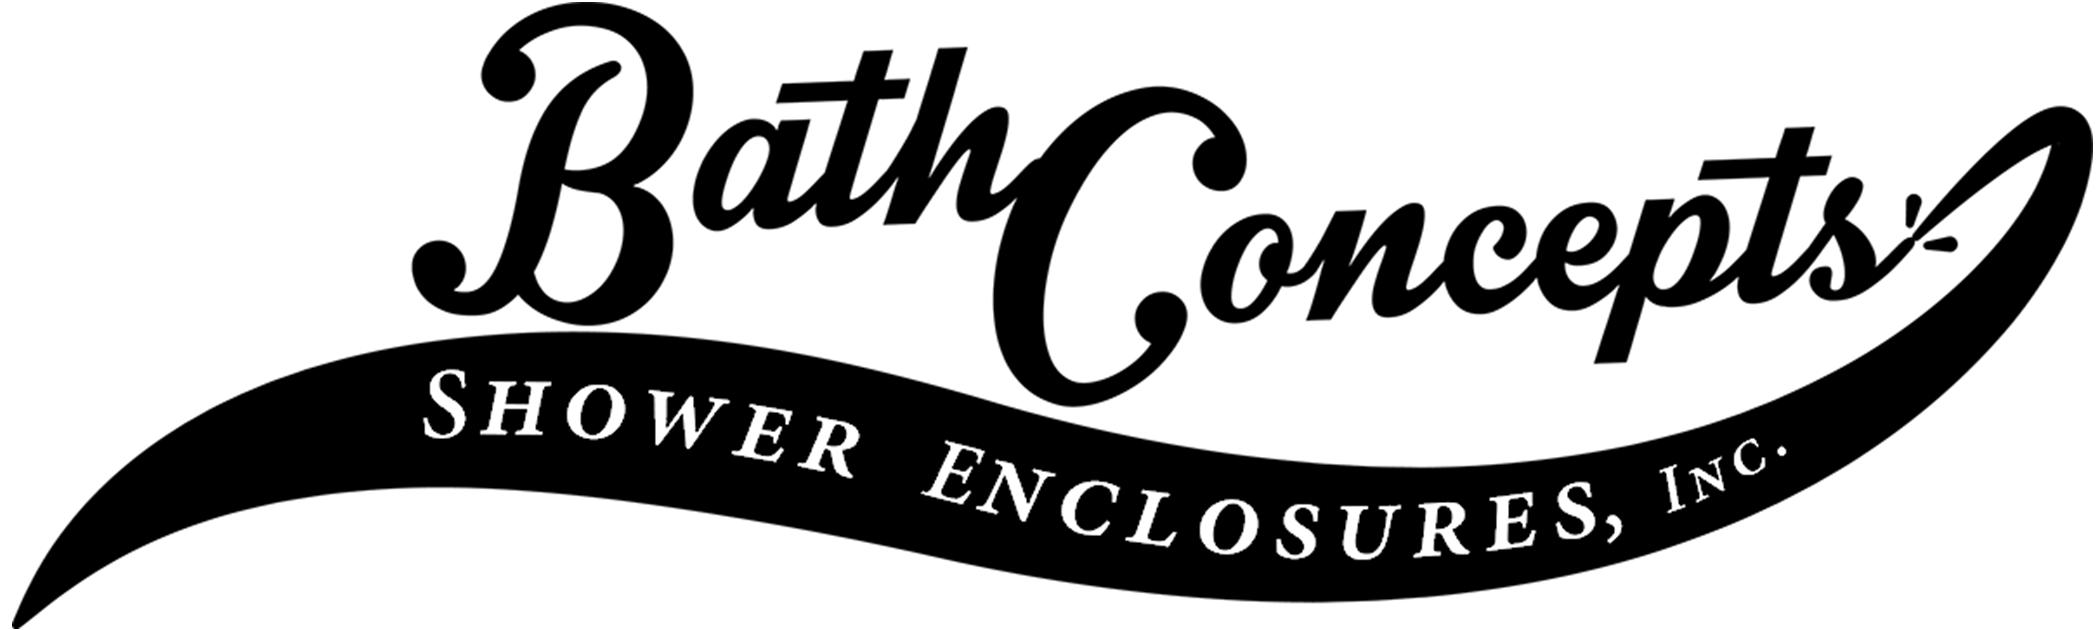 Bath Concepts